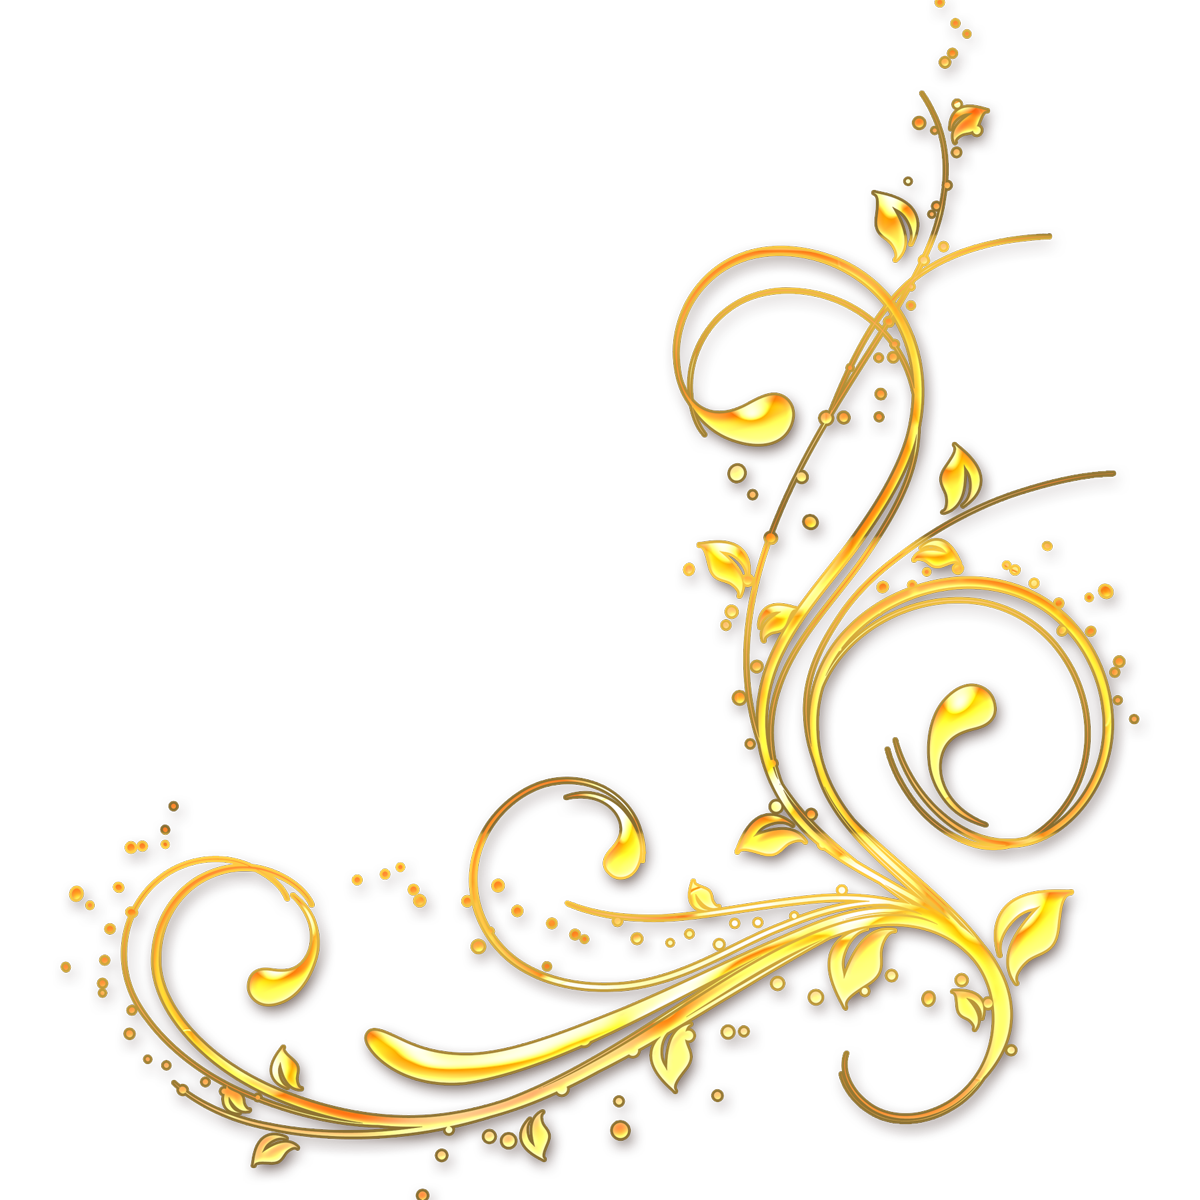 0 69aac Acf2c657 Orig Png 1200 1200 Flower Background Wallpaper Flower Illustration Gold Pattern